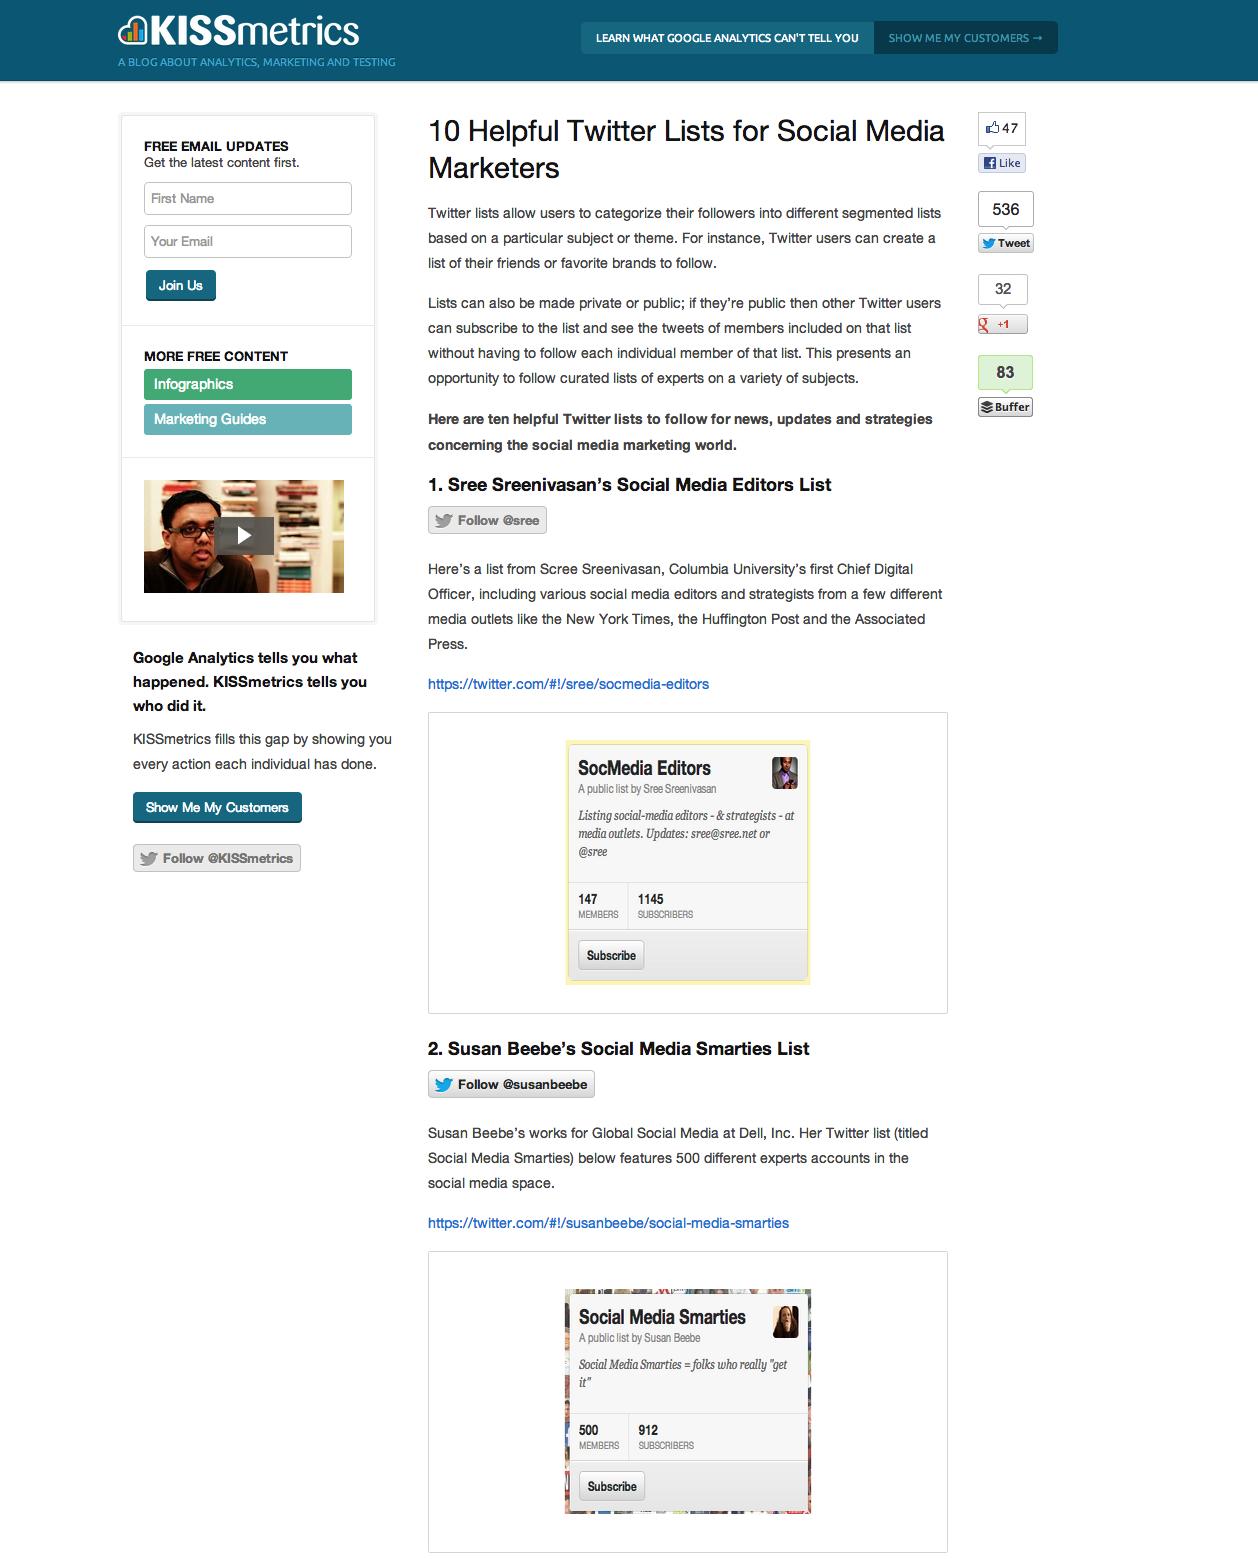 KissMetrics Blog - 10 Helpful Twitter Lists for Social Media Marketers